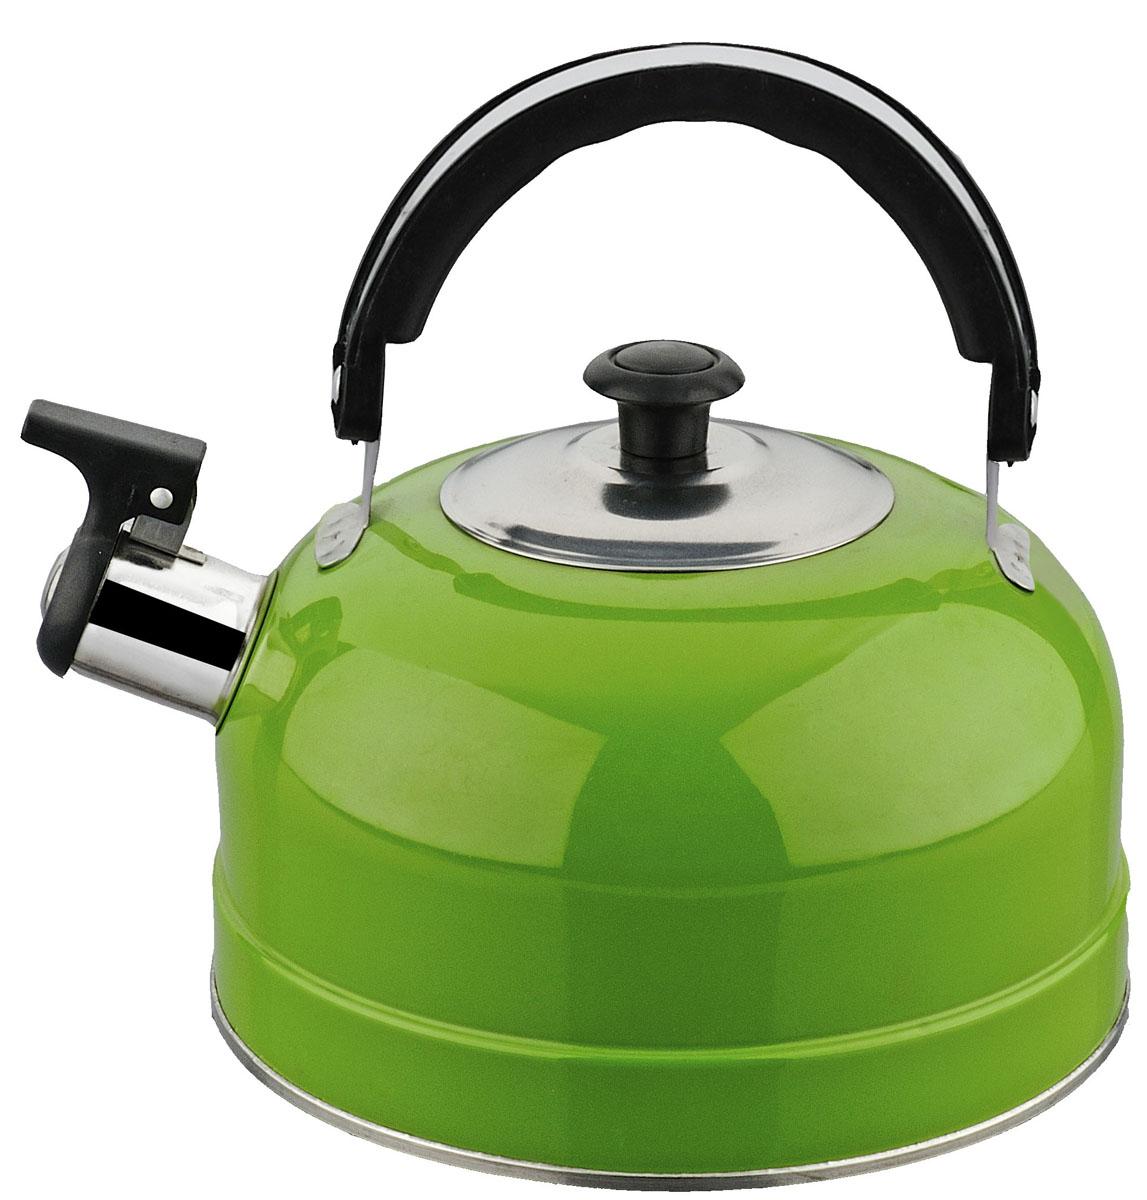 Чайник Irit, со свистком, цвет: зеленый, 2,5 л чайник riess pastell со свистком цвет розовый 2 л